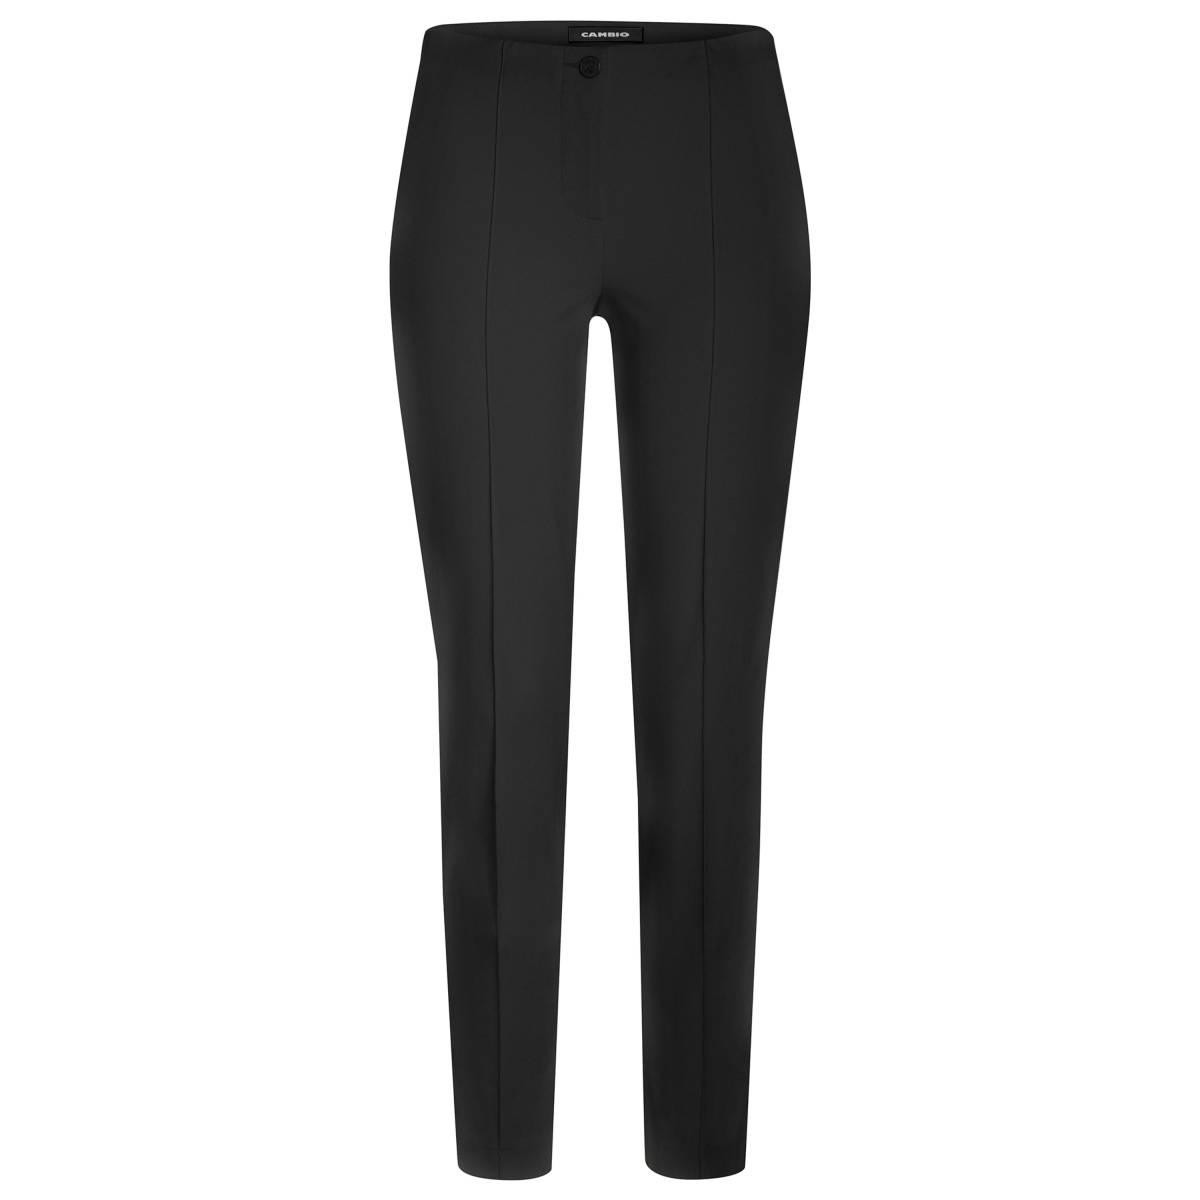 CAMBIO pantalon ros L29-5